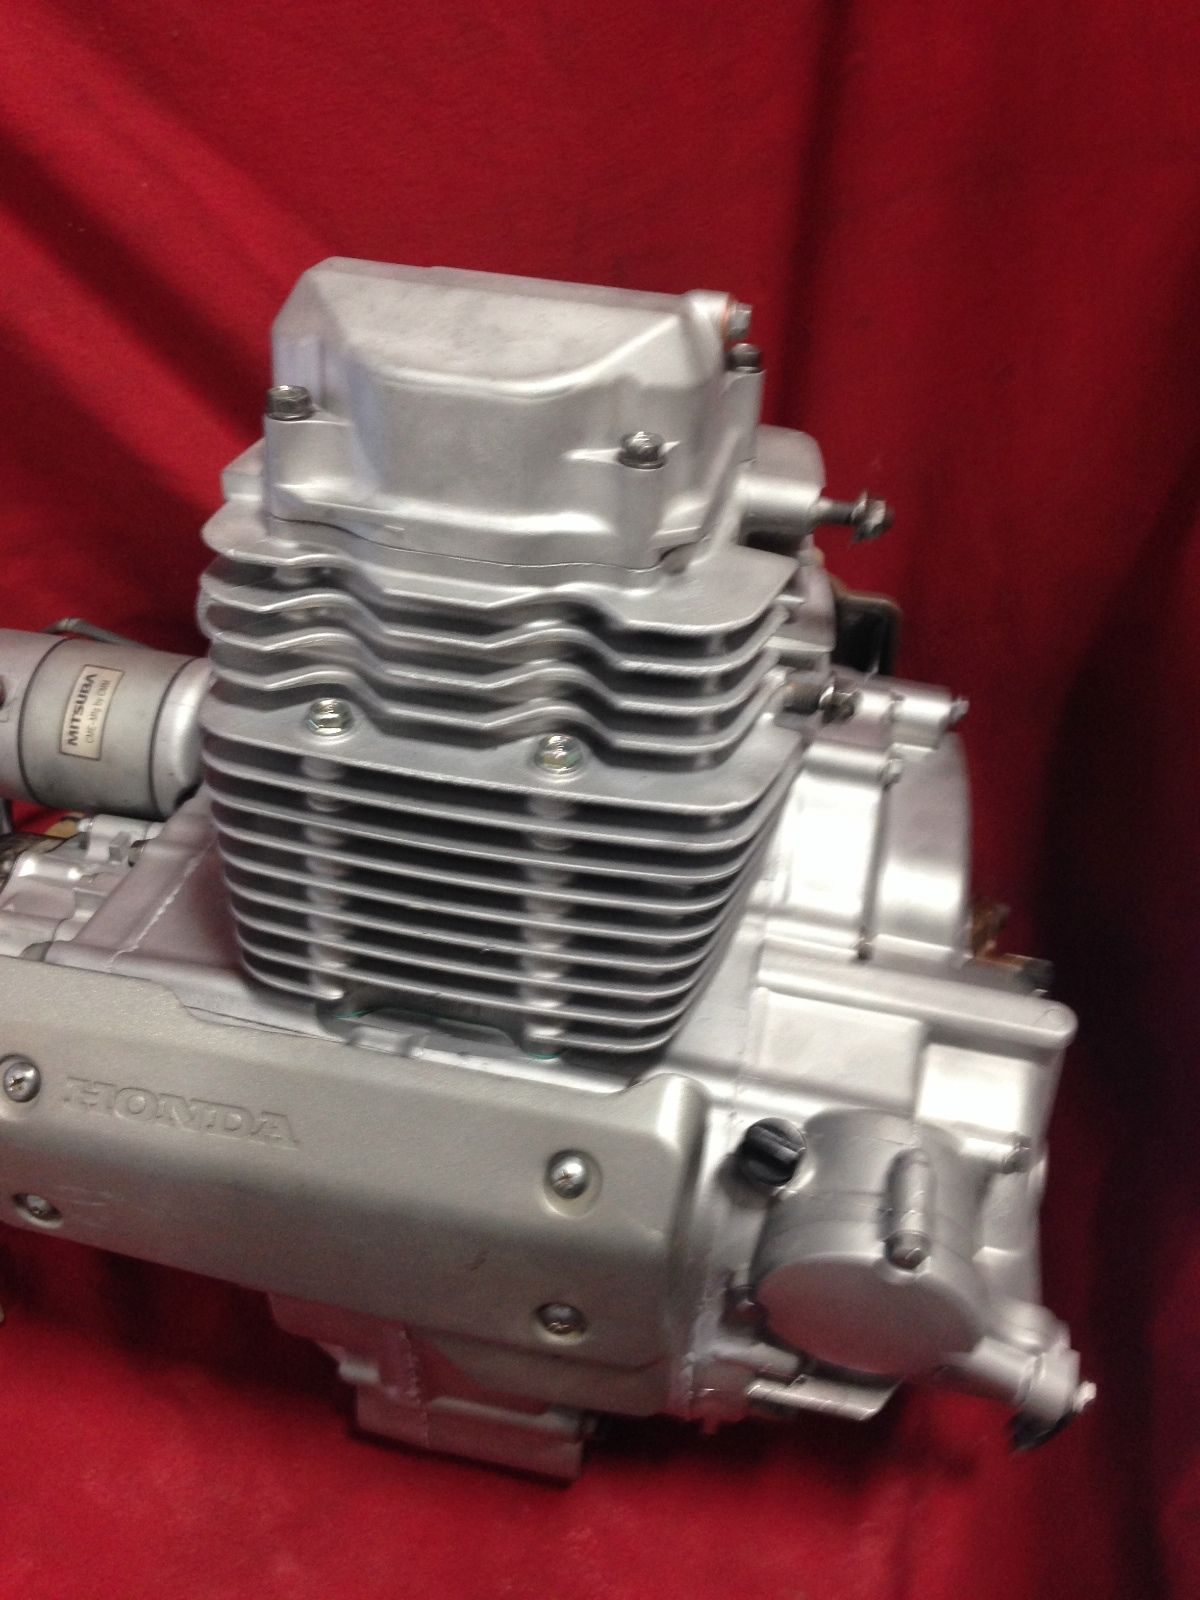 Remanufactured Honda Rancher TRX 350 Crate Engine ...